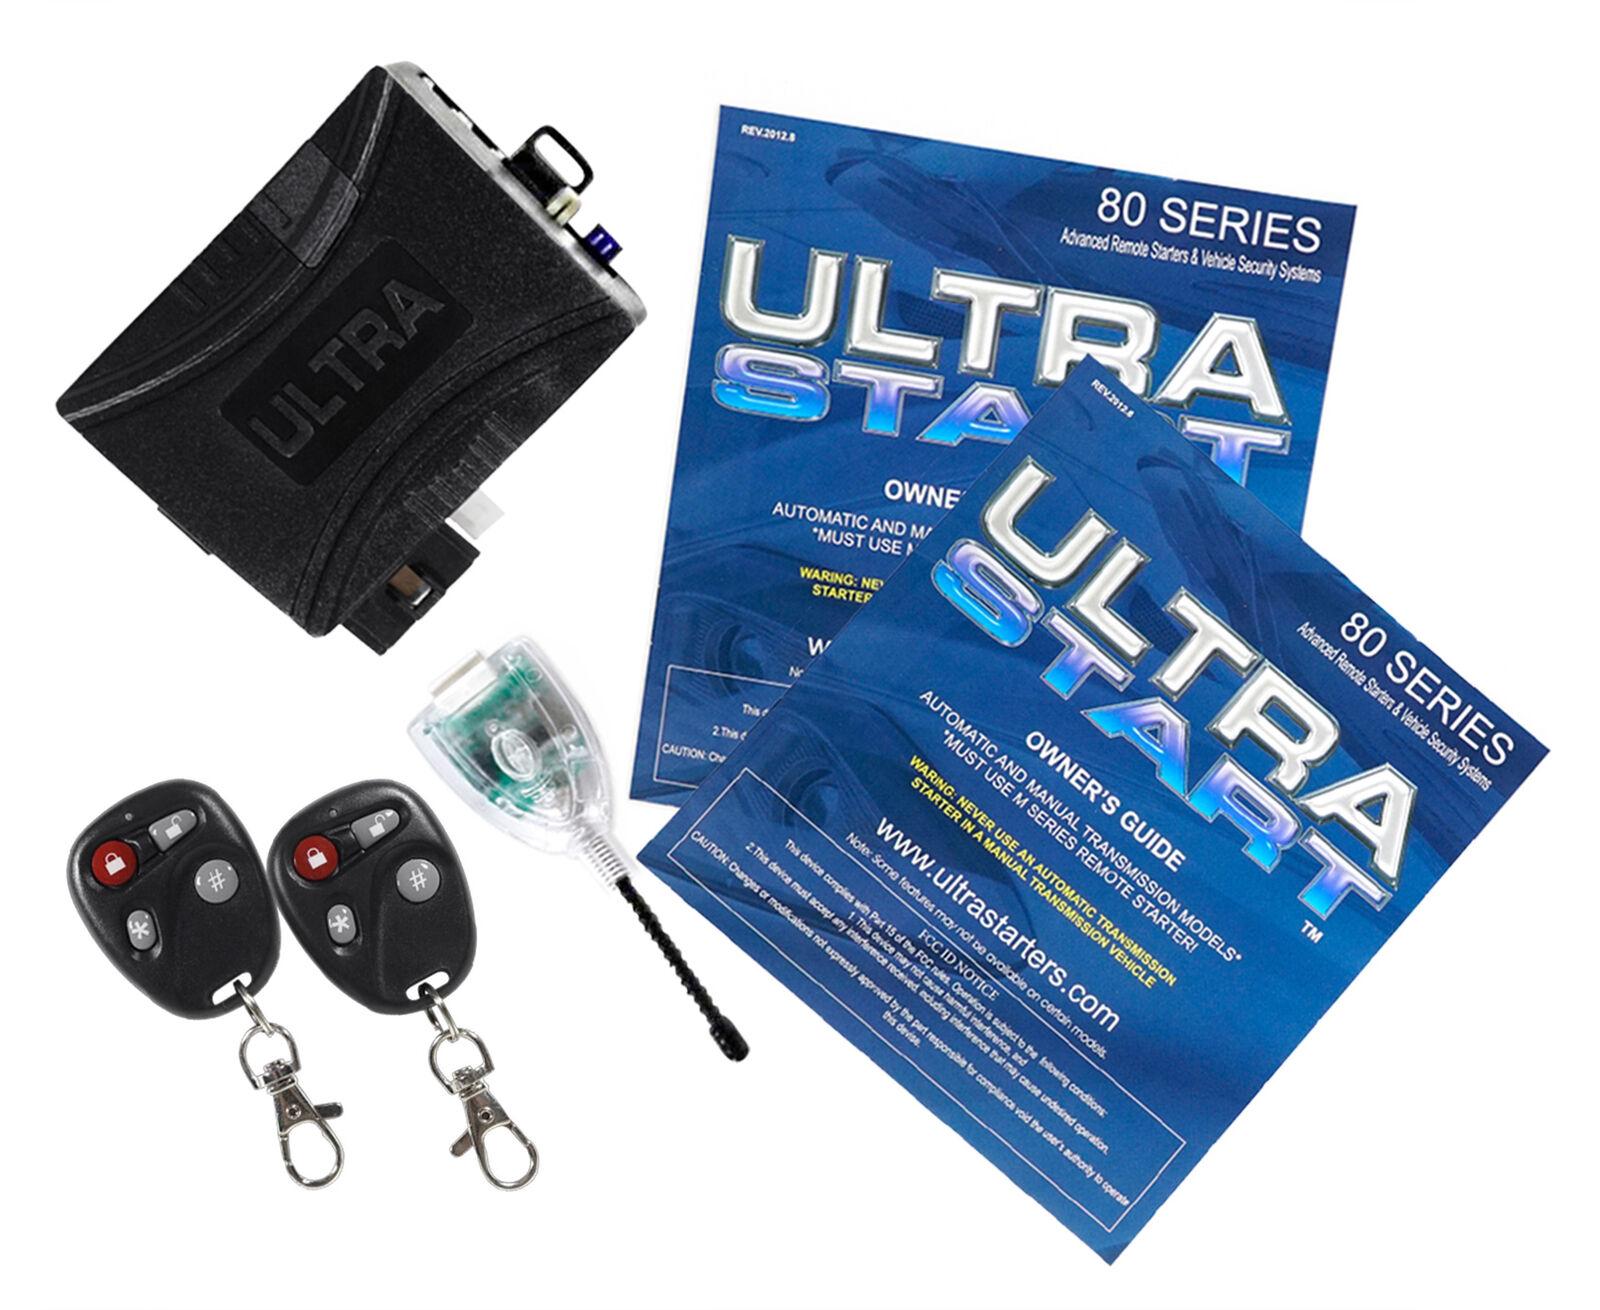 Ultrastart U1280 Dp 2800 Ft Foot Car Remote Starter Keyless Entry Ultra Start For Sale Online Ebay